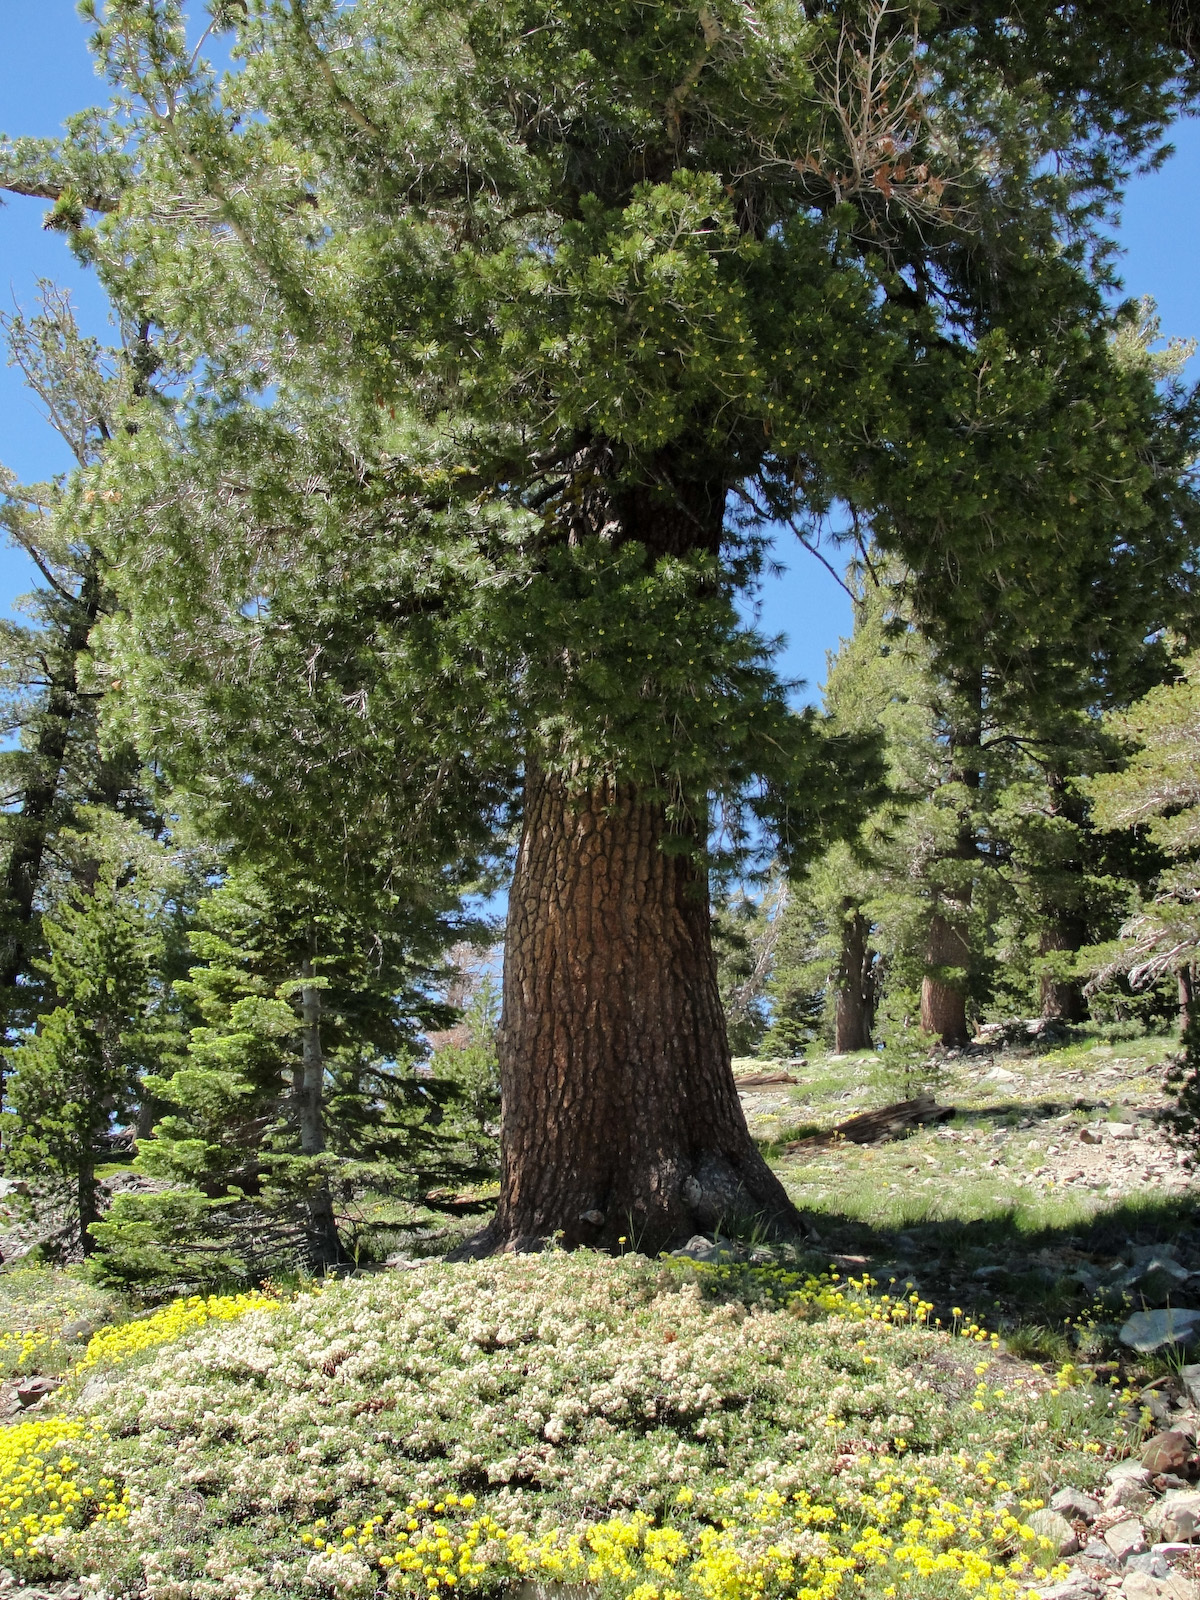 Image of western white pine